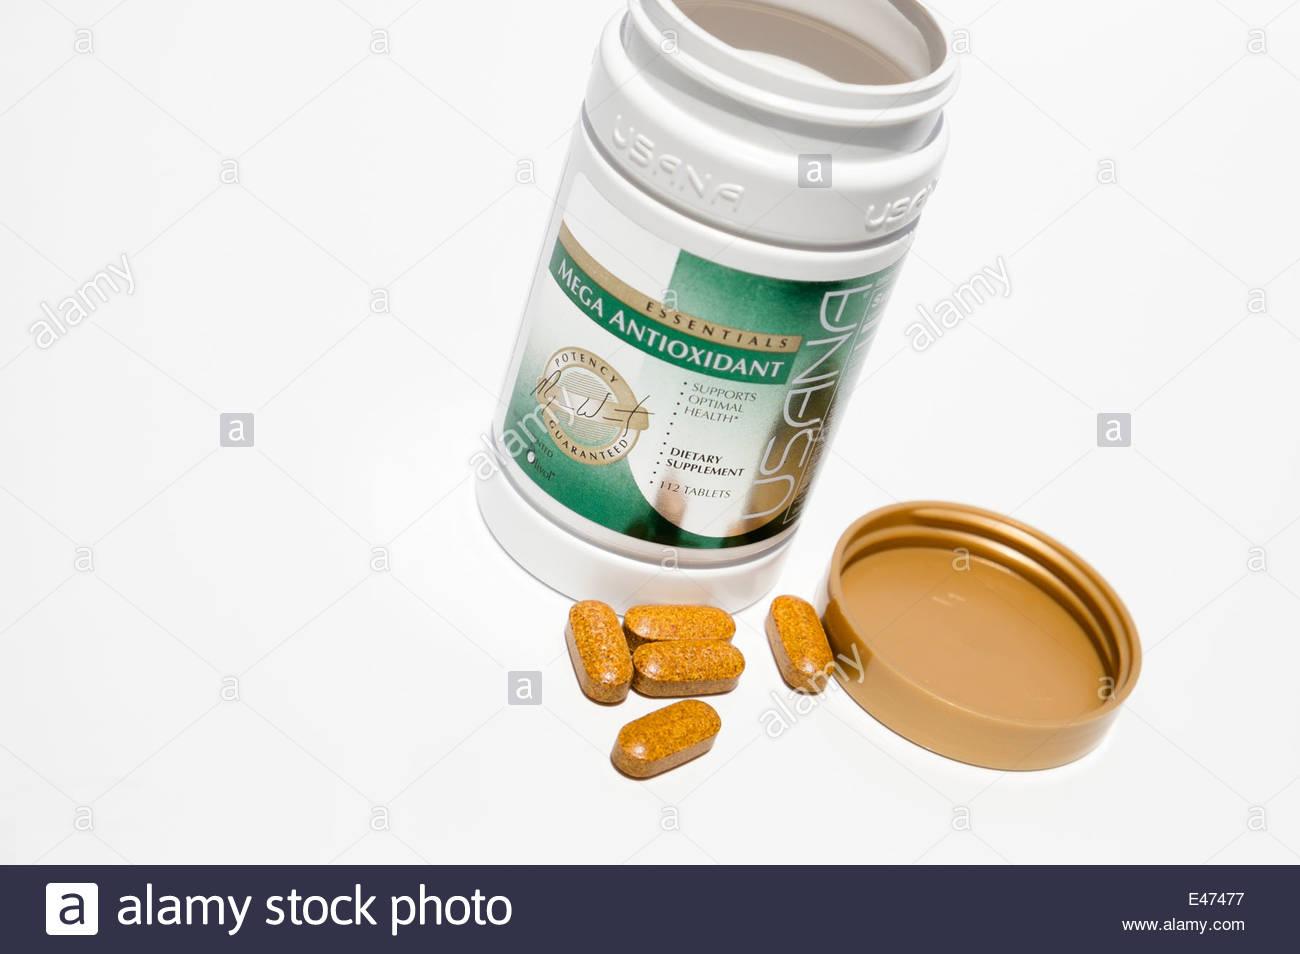 Las tabletas de la marca mega antioxidante Usana en la mesa Imagen De Stock